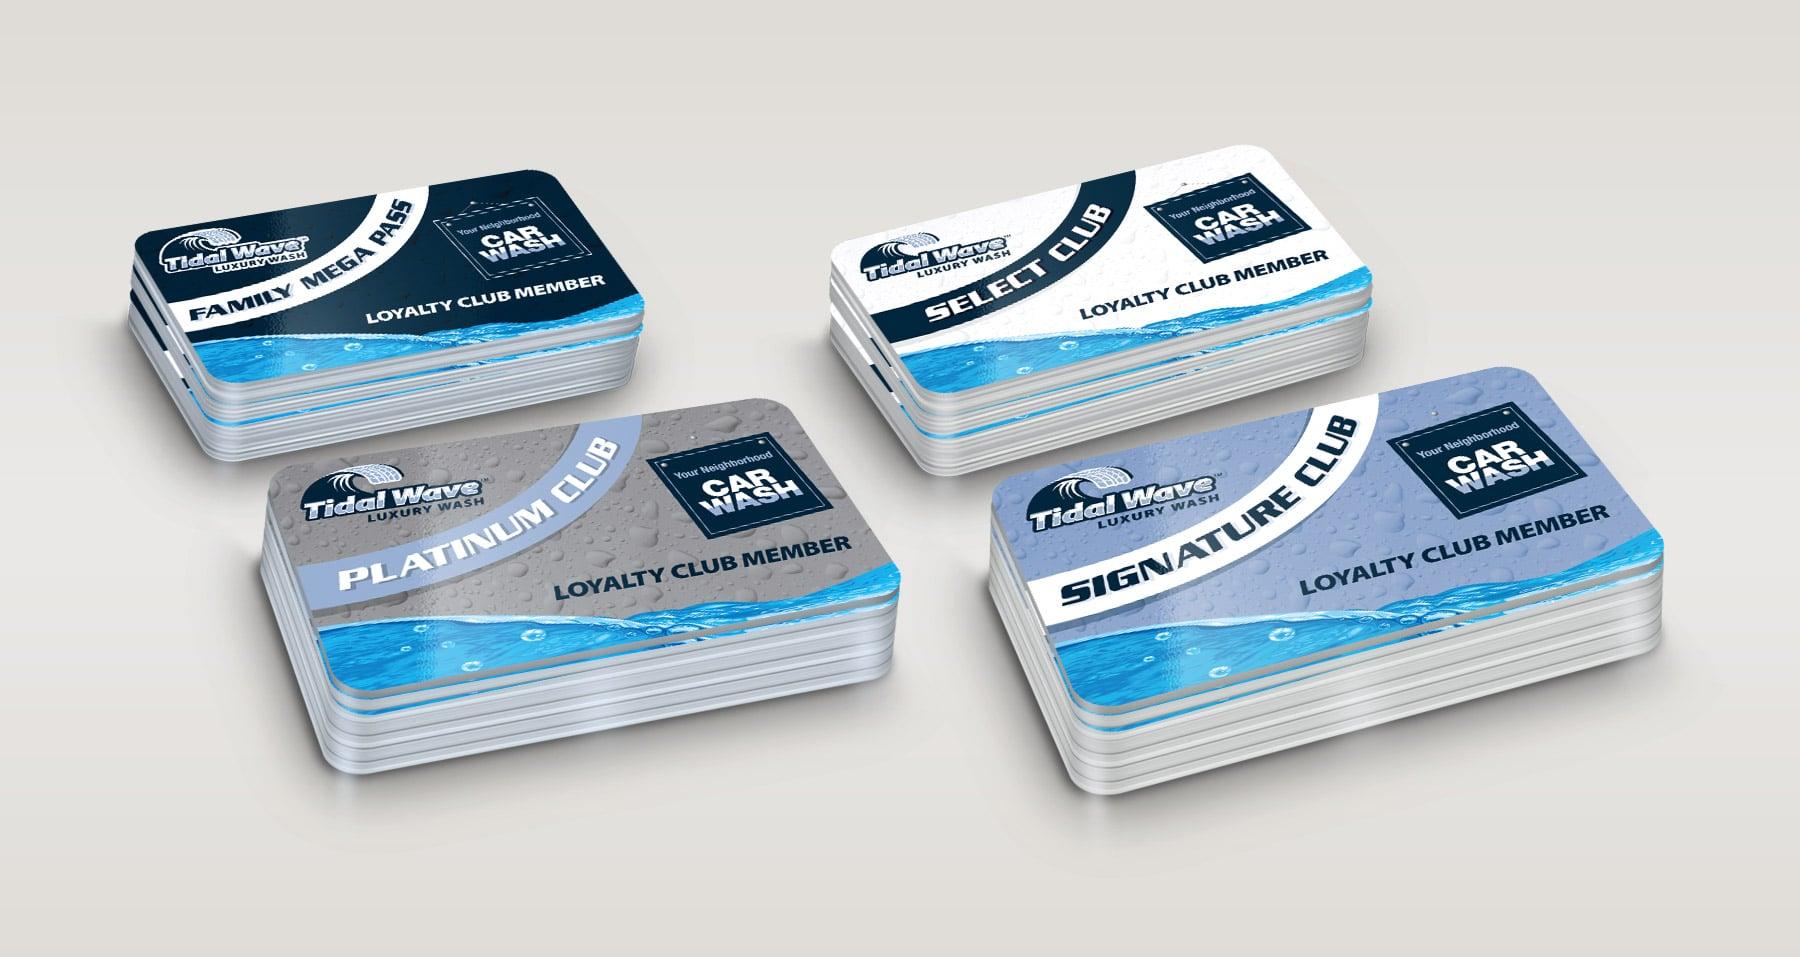 Tidal Wave Loyalty Card designs